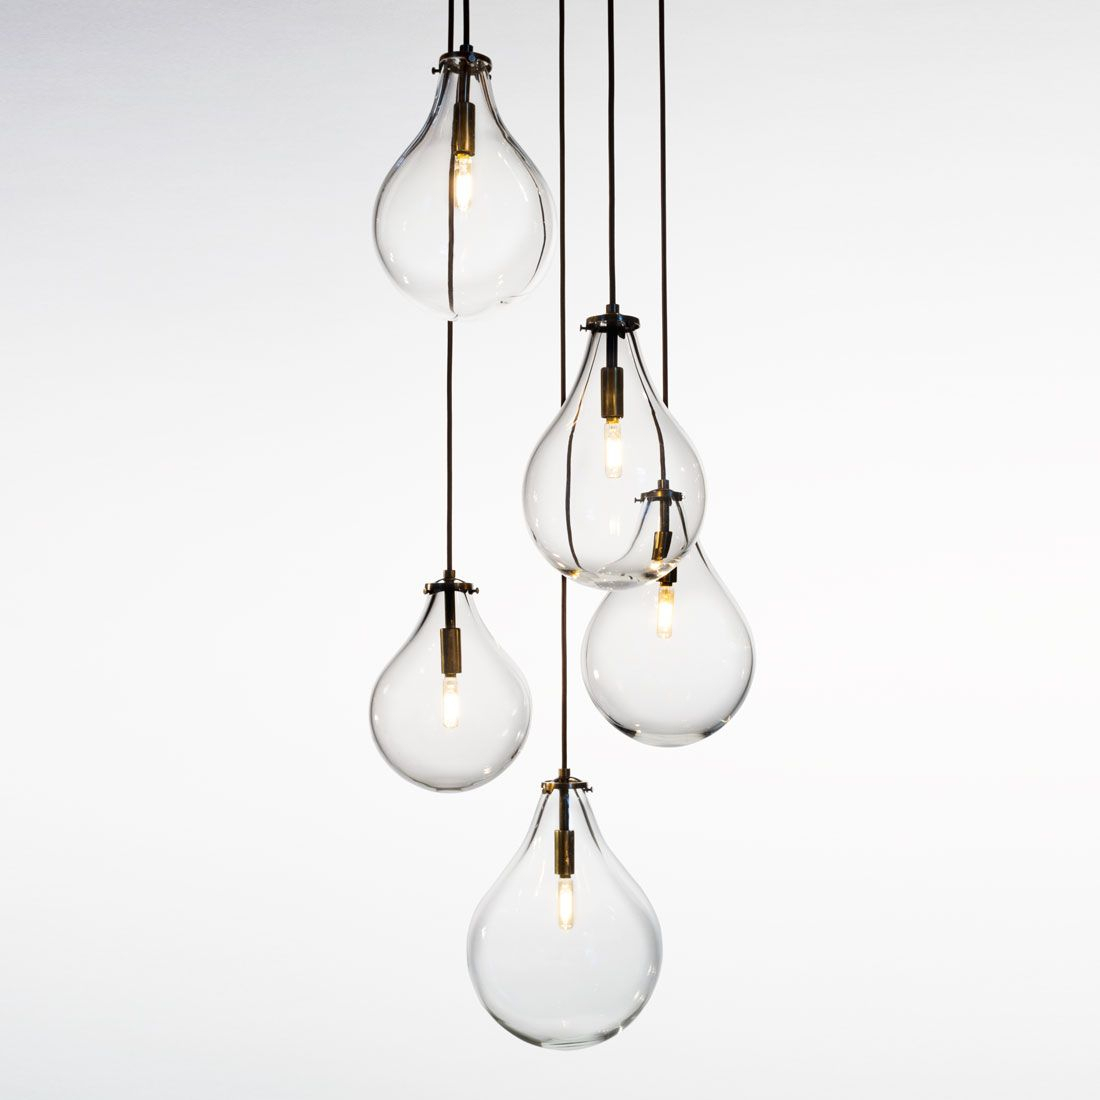 Teardrop Chandelier | Althuis In 2019 | Lighting, Glass within Berenice 3-Light Cluster Teardrop Pendants (Image 26 of 30)